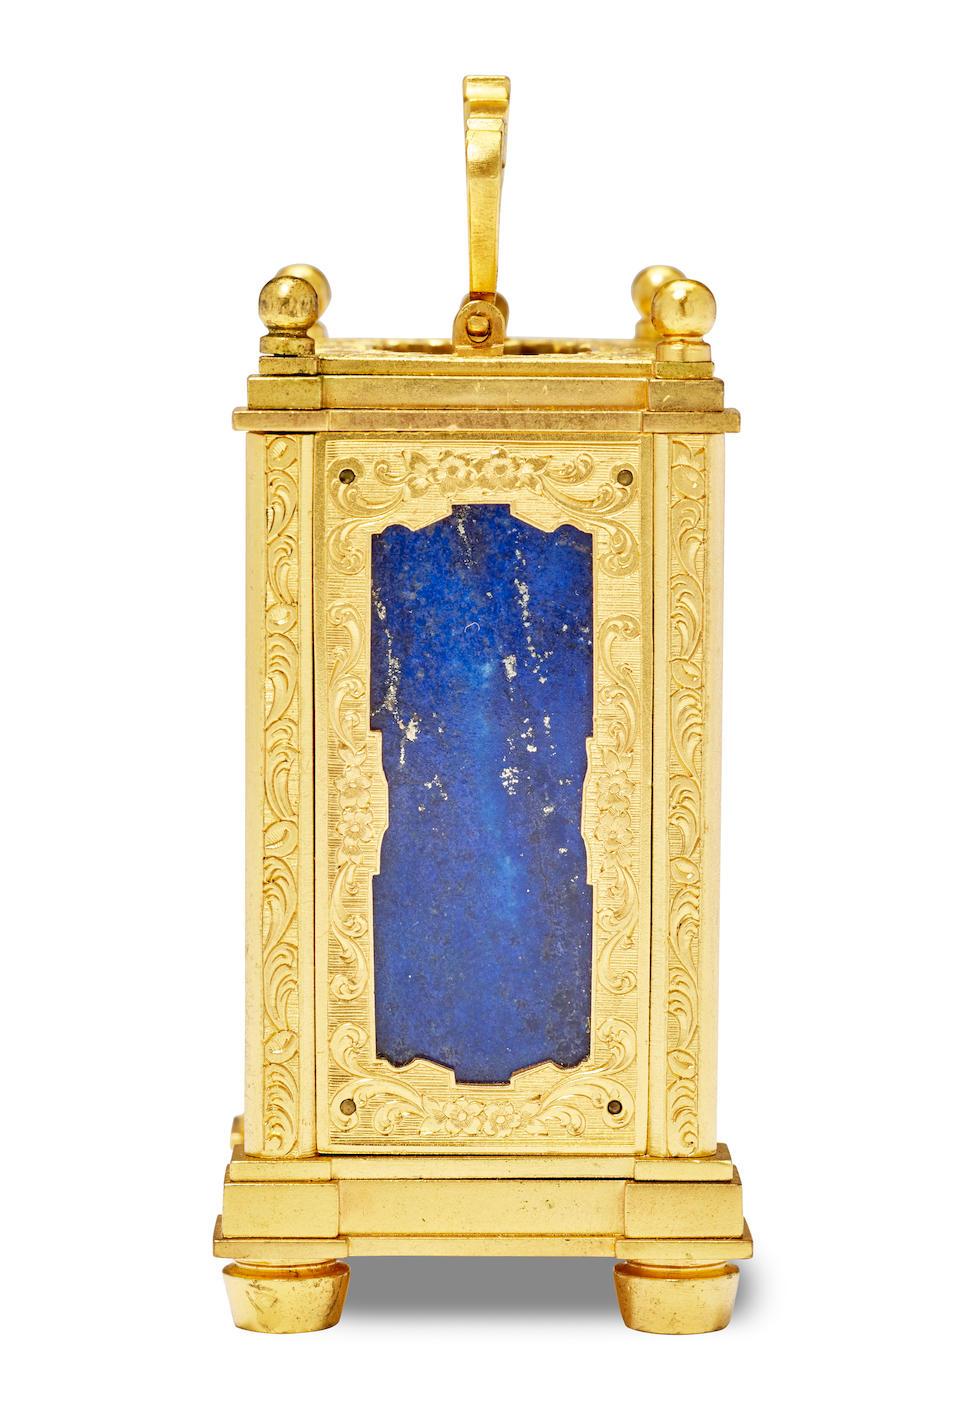 A fine miniature carriage timepiece with lapis lazuli side panels Thomas Cole, London, retailed by R. & S. Garrard, Panton Street, Haymarket Circa 1845